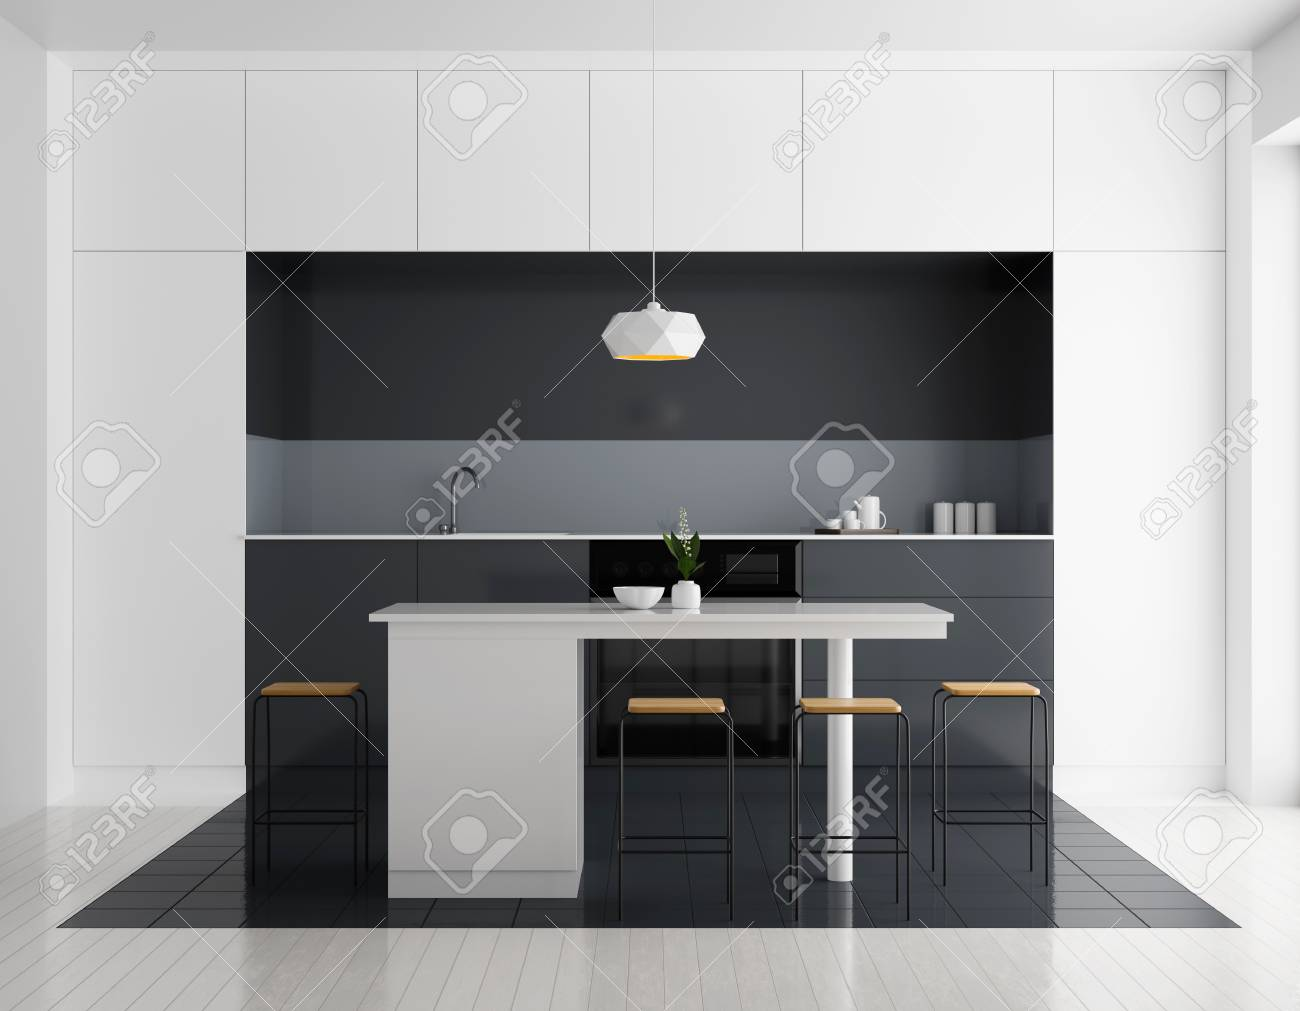 Modern bright kitchen interior. Minimalistic kitchen design with bar and  stools. 9D illustration.